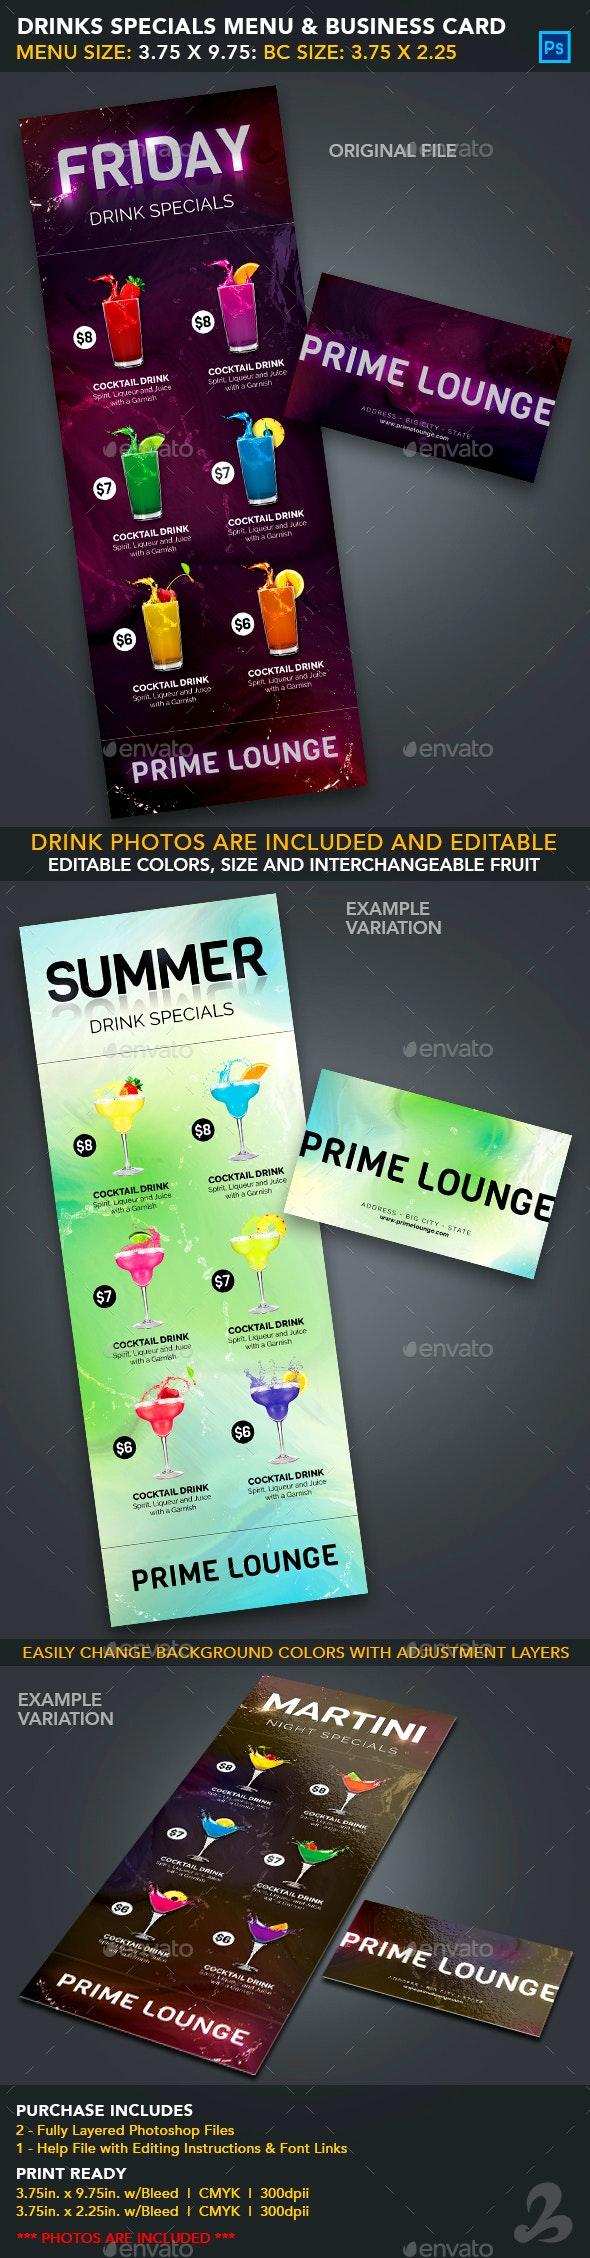 Drink Specials Menu & Business Card Template 1 - Food Menus Print Templates